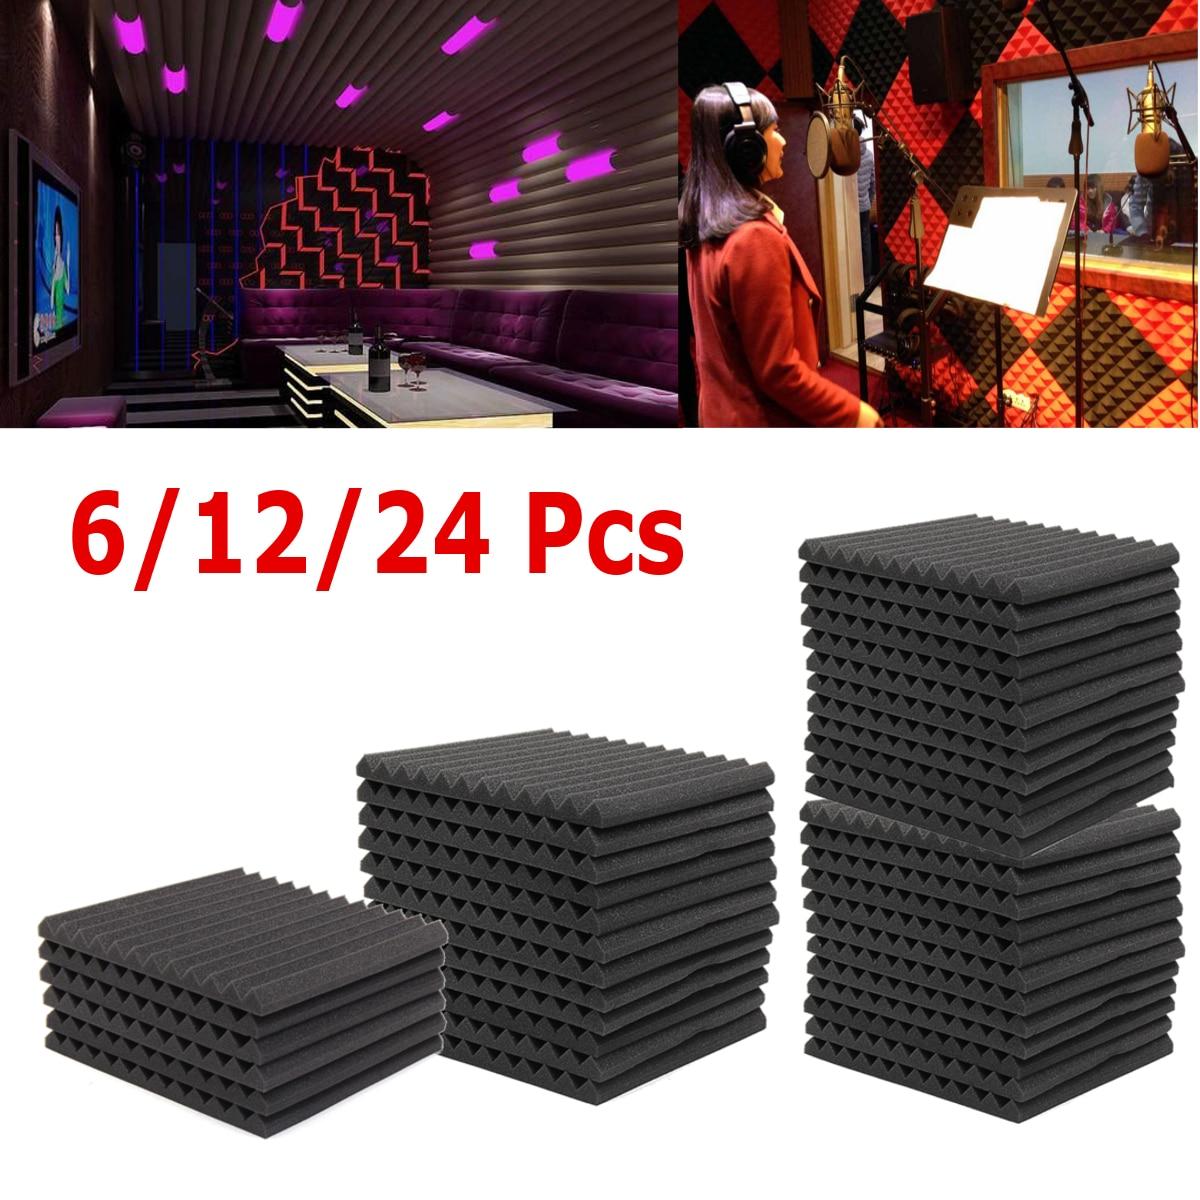 6Pcs/12Pcs Soundproofing Foam Acoustic Foam Studio Absorbing Wedge Foam Tiles Wall Panels for KTV Sound Studio 300*300*25mm bqlzr 12 pieces light yellow 30x30x2 5cm home deco sound absorbing panels